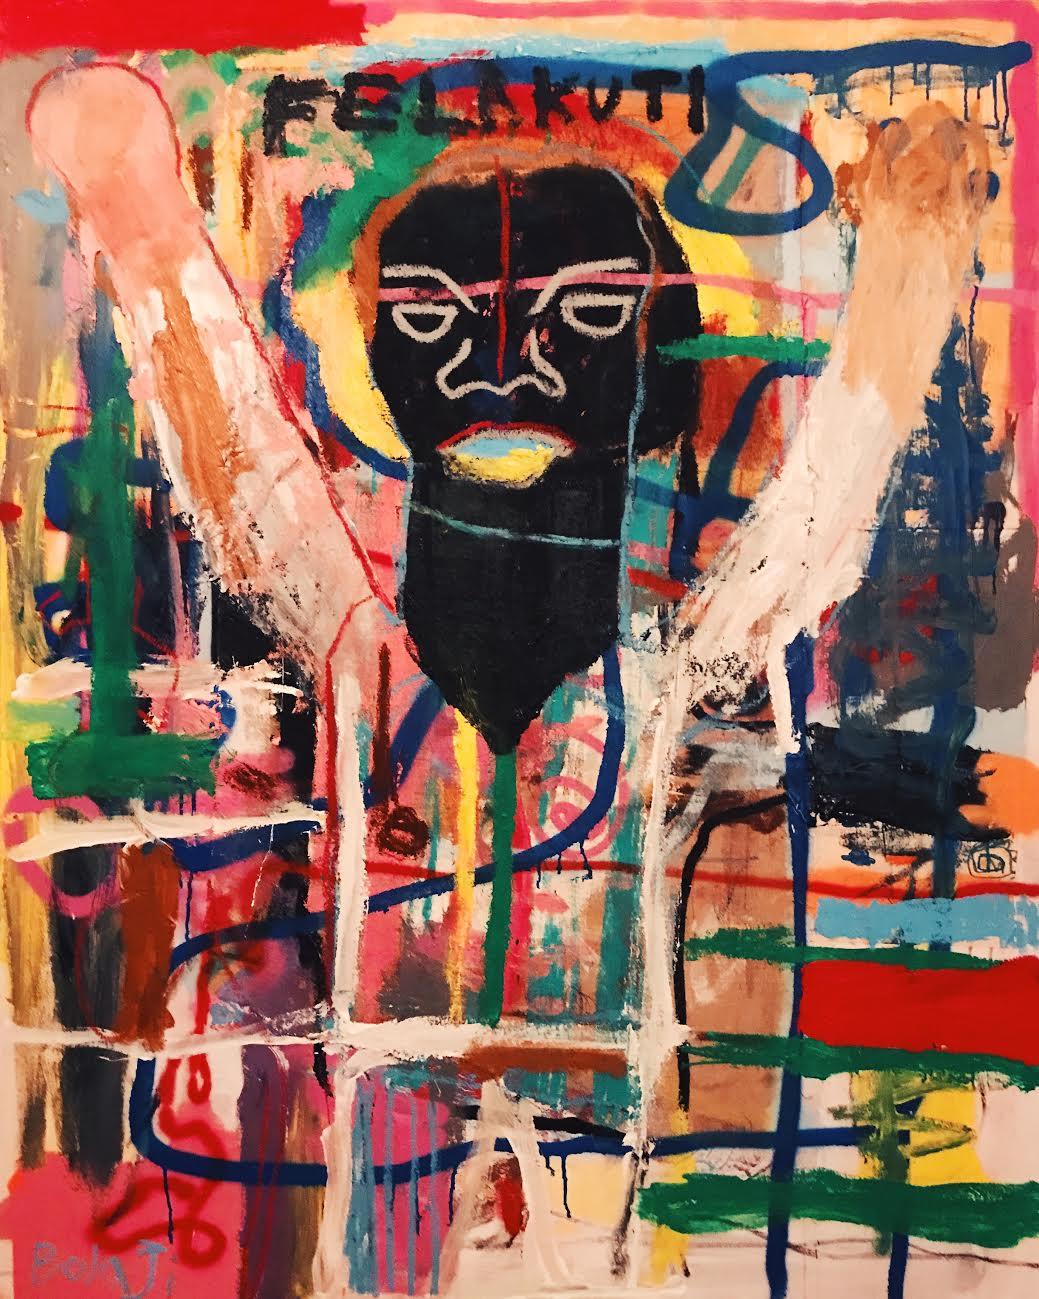 """Black President - A Portrait Of Fela Kuti"" by Adébayo Bolaji, 2018"